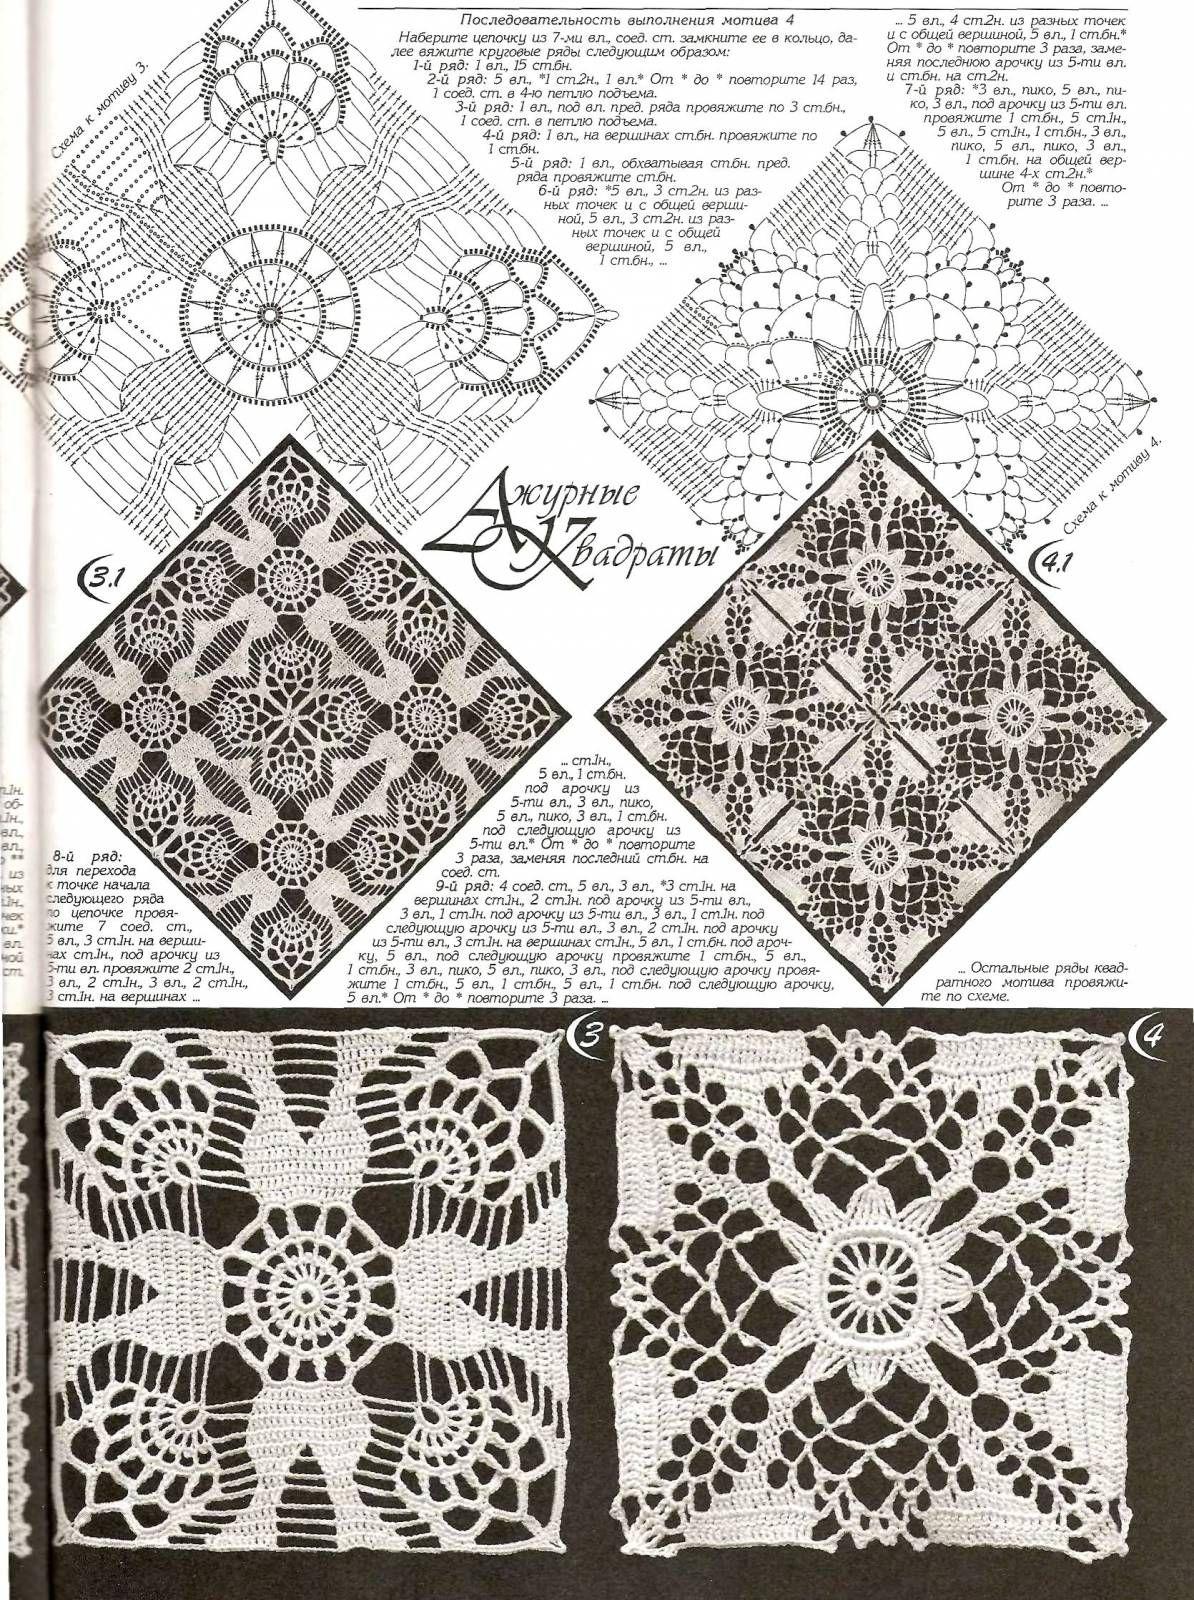 4CKab5PRP4s.jpg (1194×1600) | Grannies | Pinterest | Puntos crochet ...